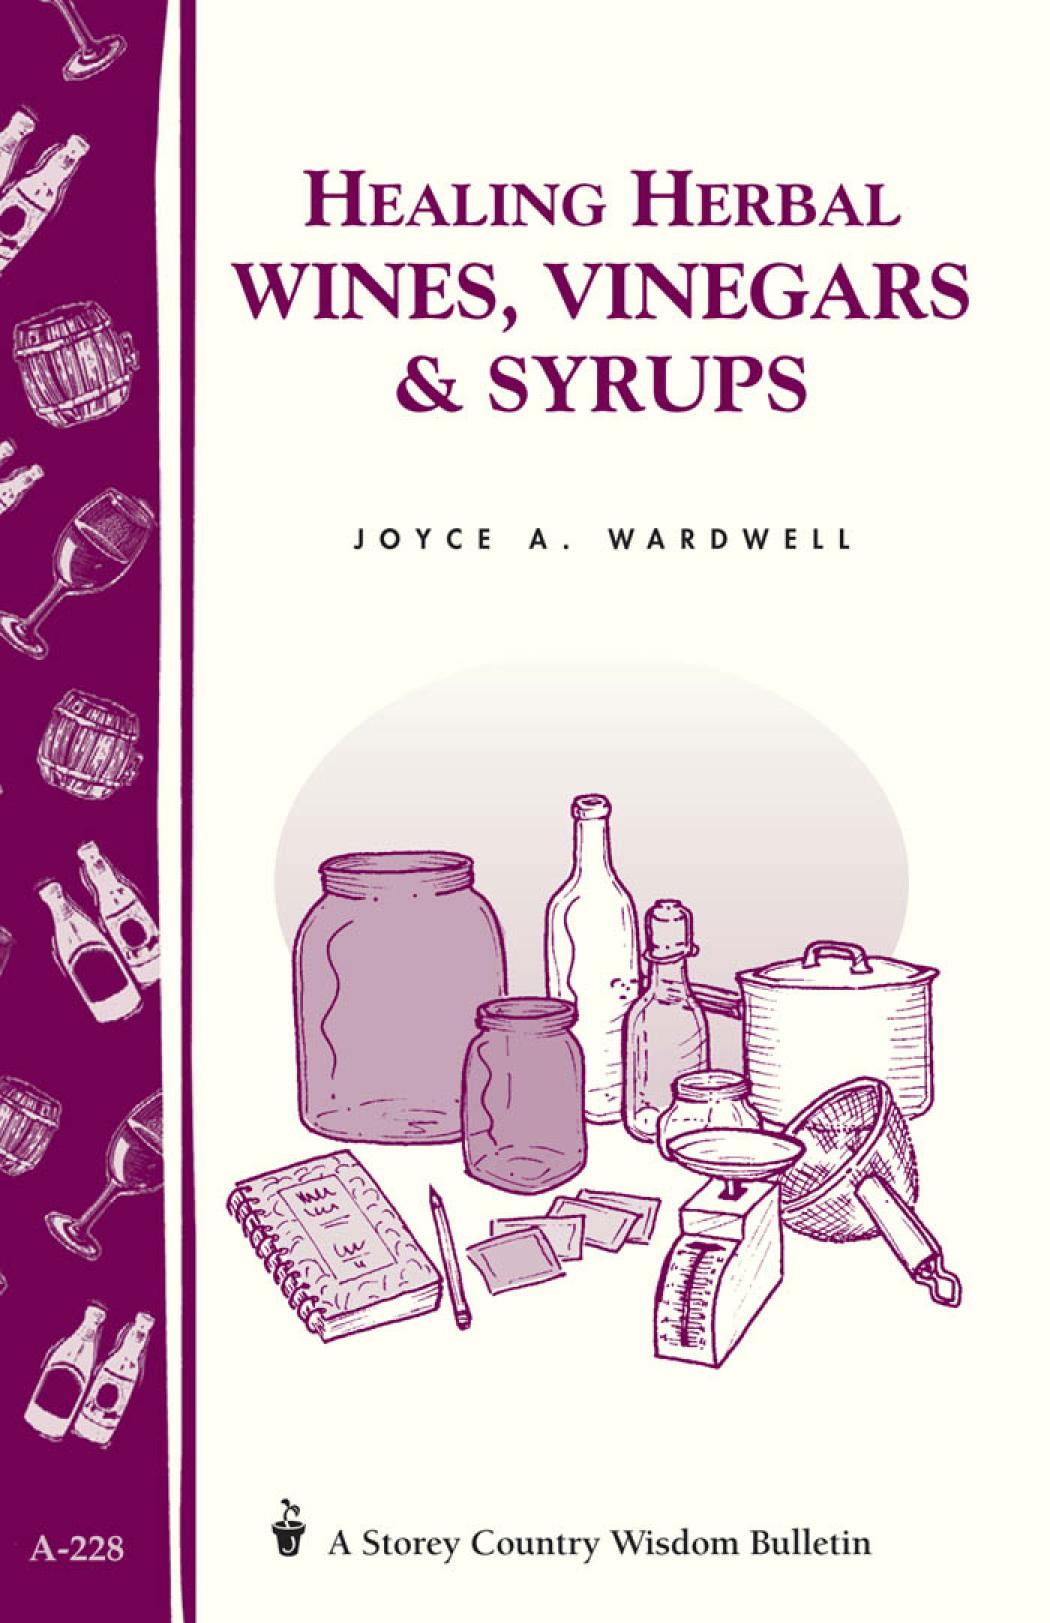 Healing Herbal Wines, Vinegars & Syrups Storey Country Wisdom Bulletin A-228 - Joyce A. Wardwell